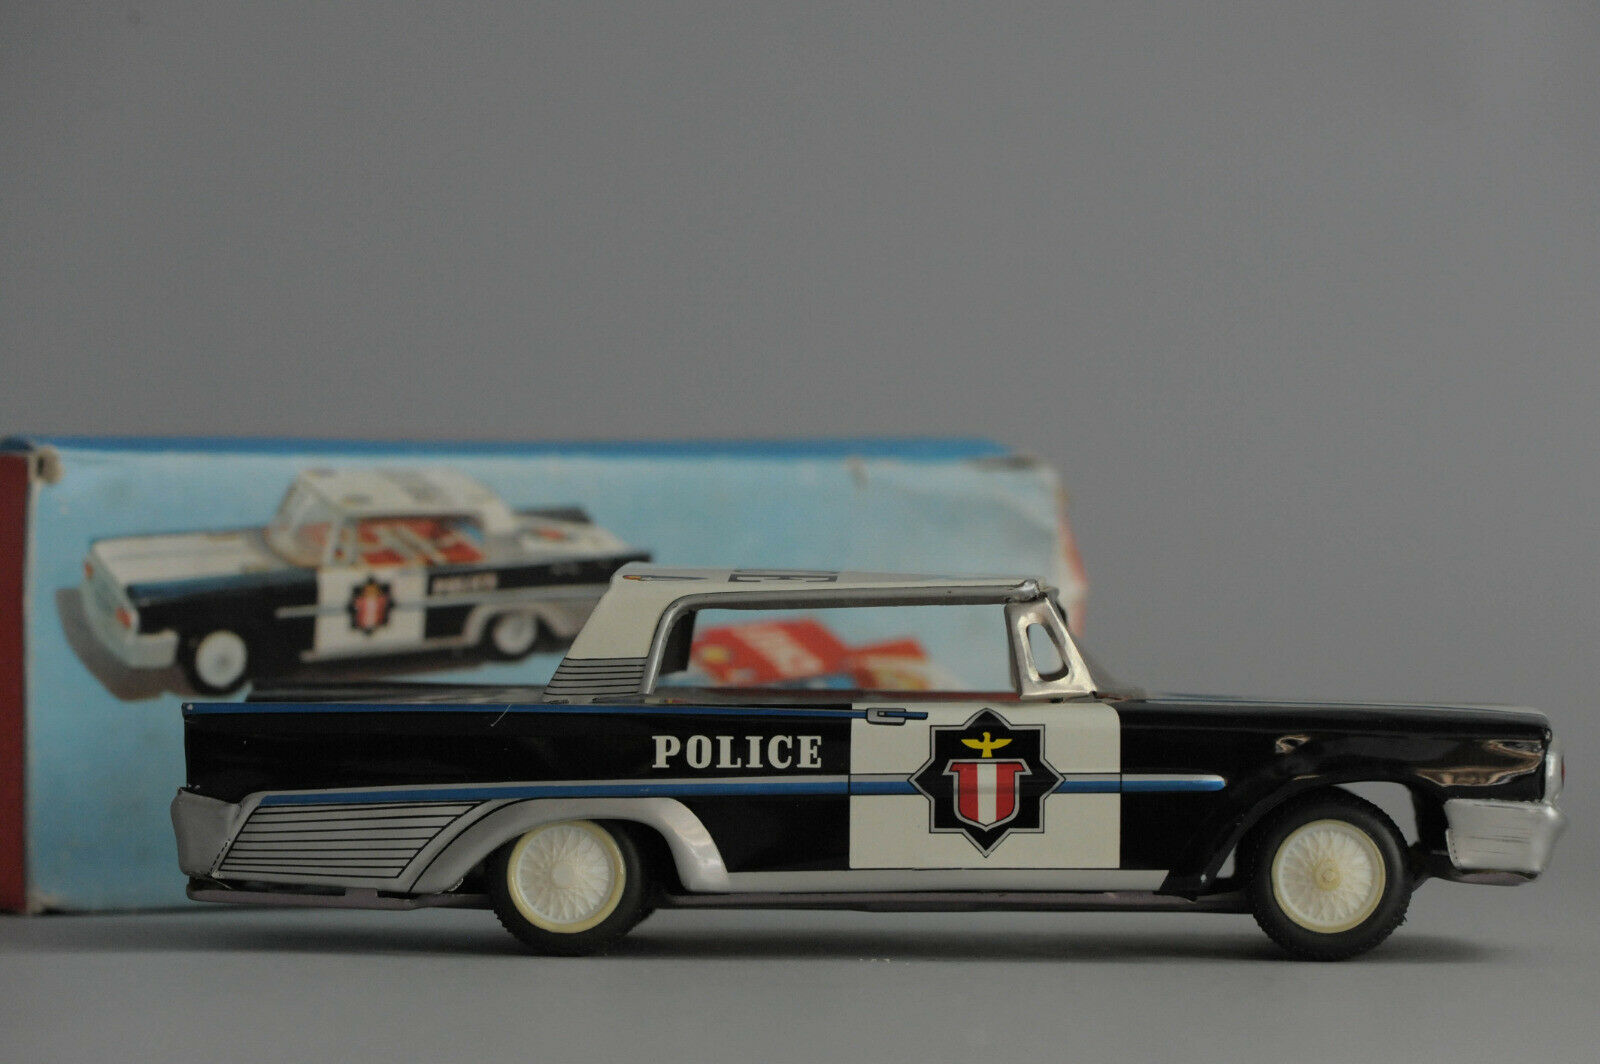 Antique De Estaño Juguete   Italia Italia Marchesini Bolonia Juguete Latta fresco en caja de policía